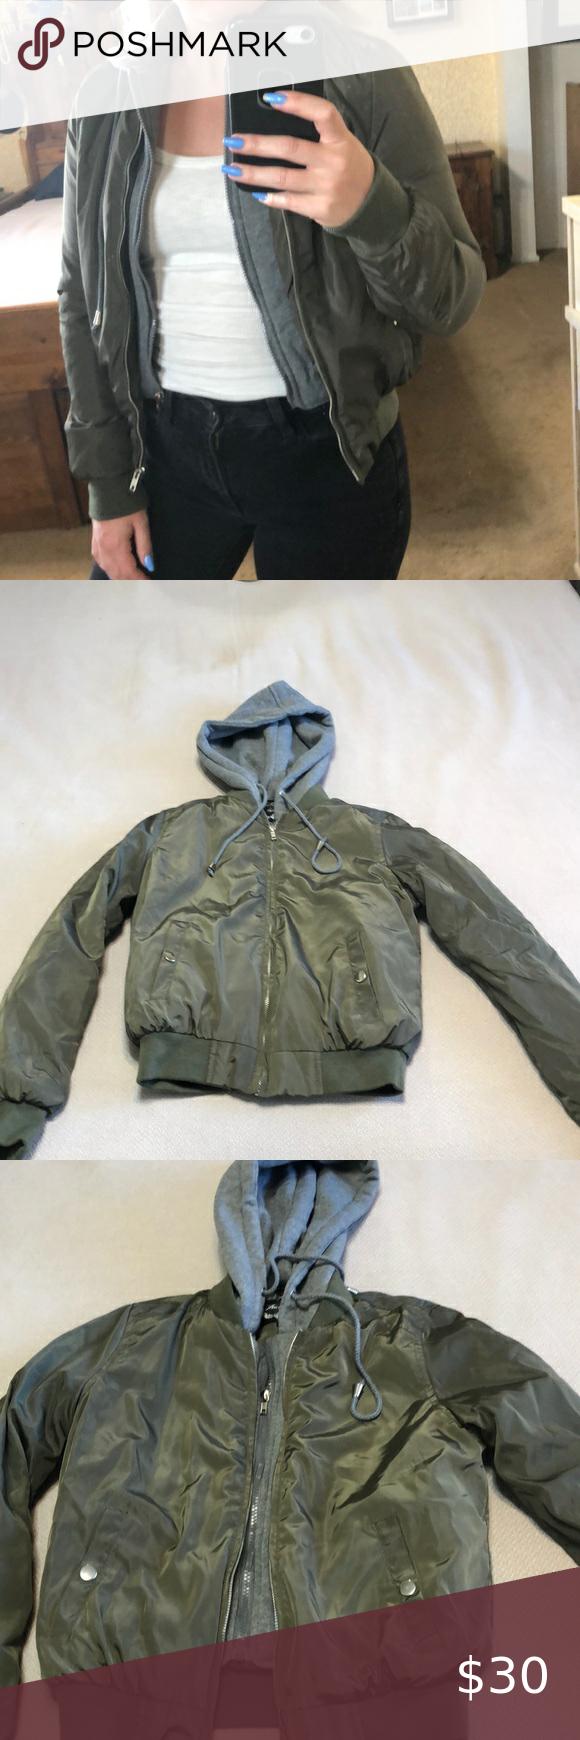 Green Puffer Jacket Green Puffer Jacket Faux Leather Bomber Jacket Brown Leather Jacket [ 1740 x 580 Pixel ]